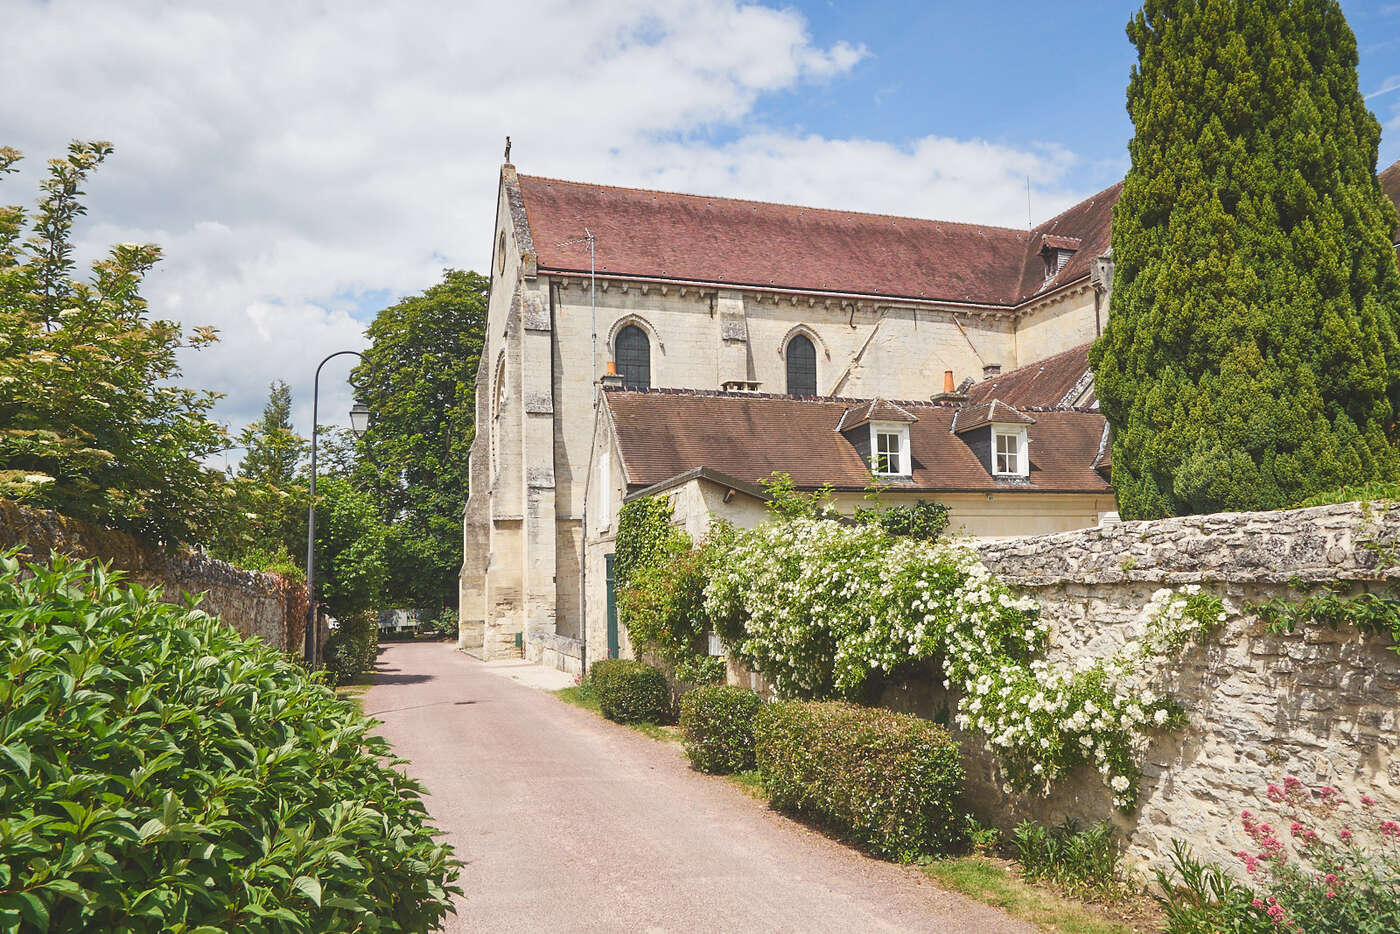 Abbaye de Saint-Jean-aux-Bois